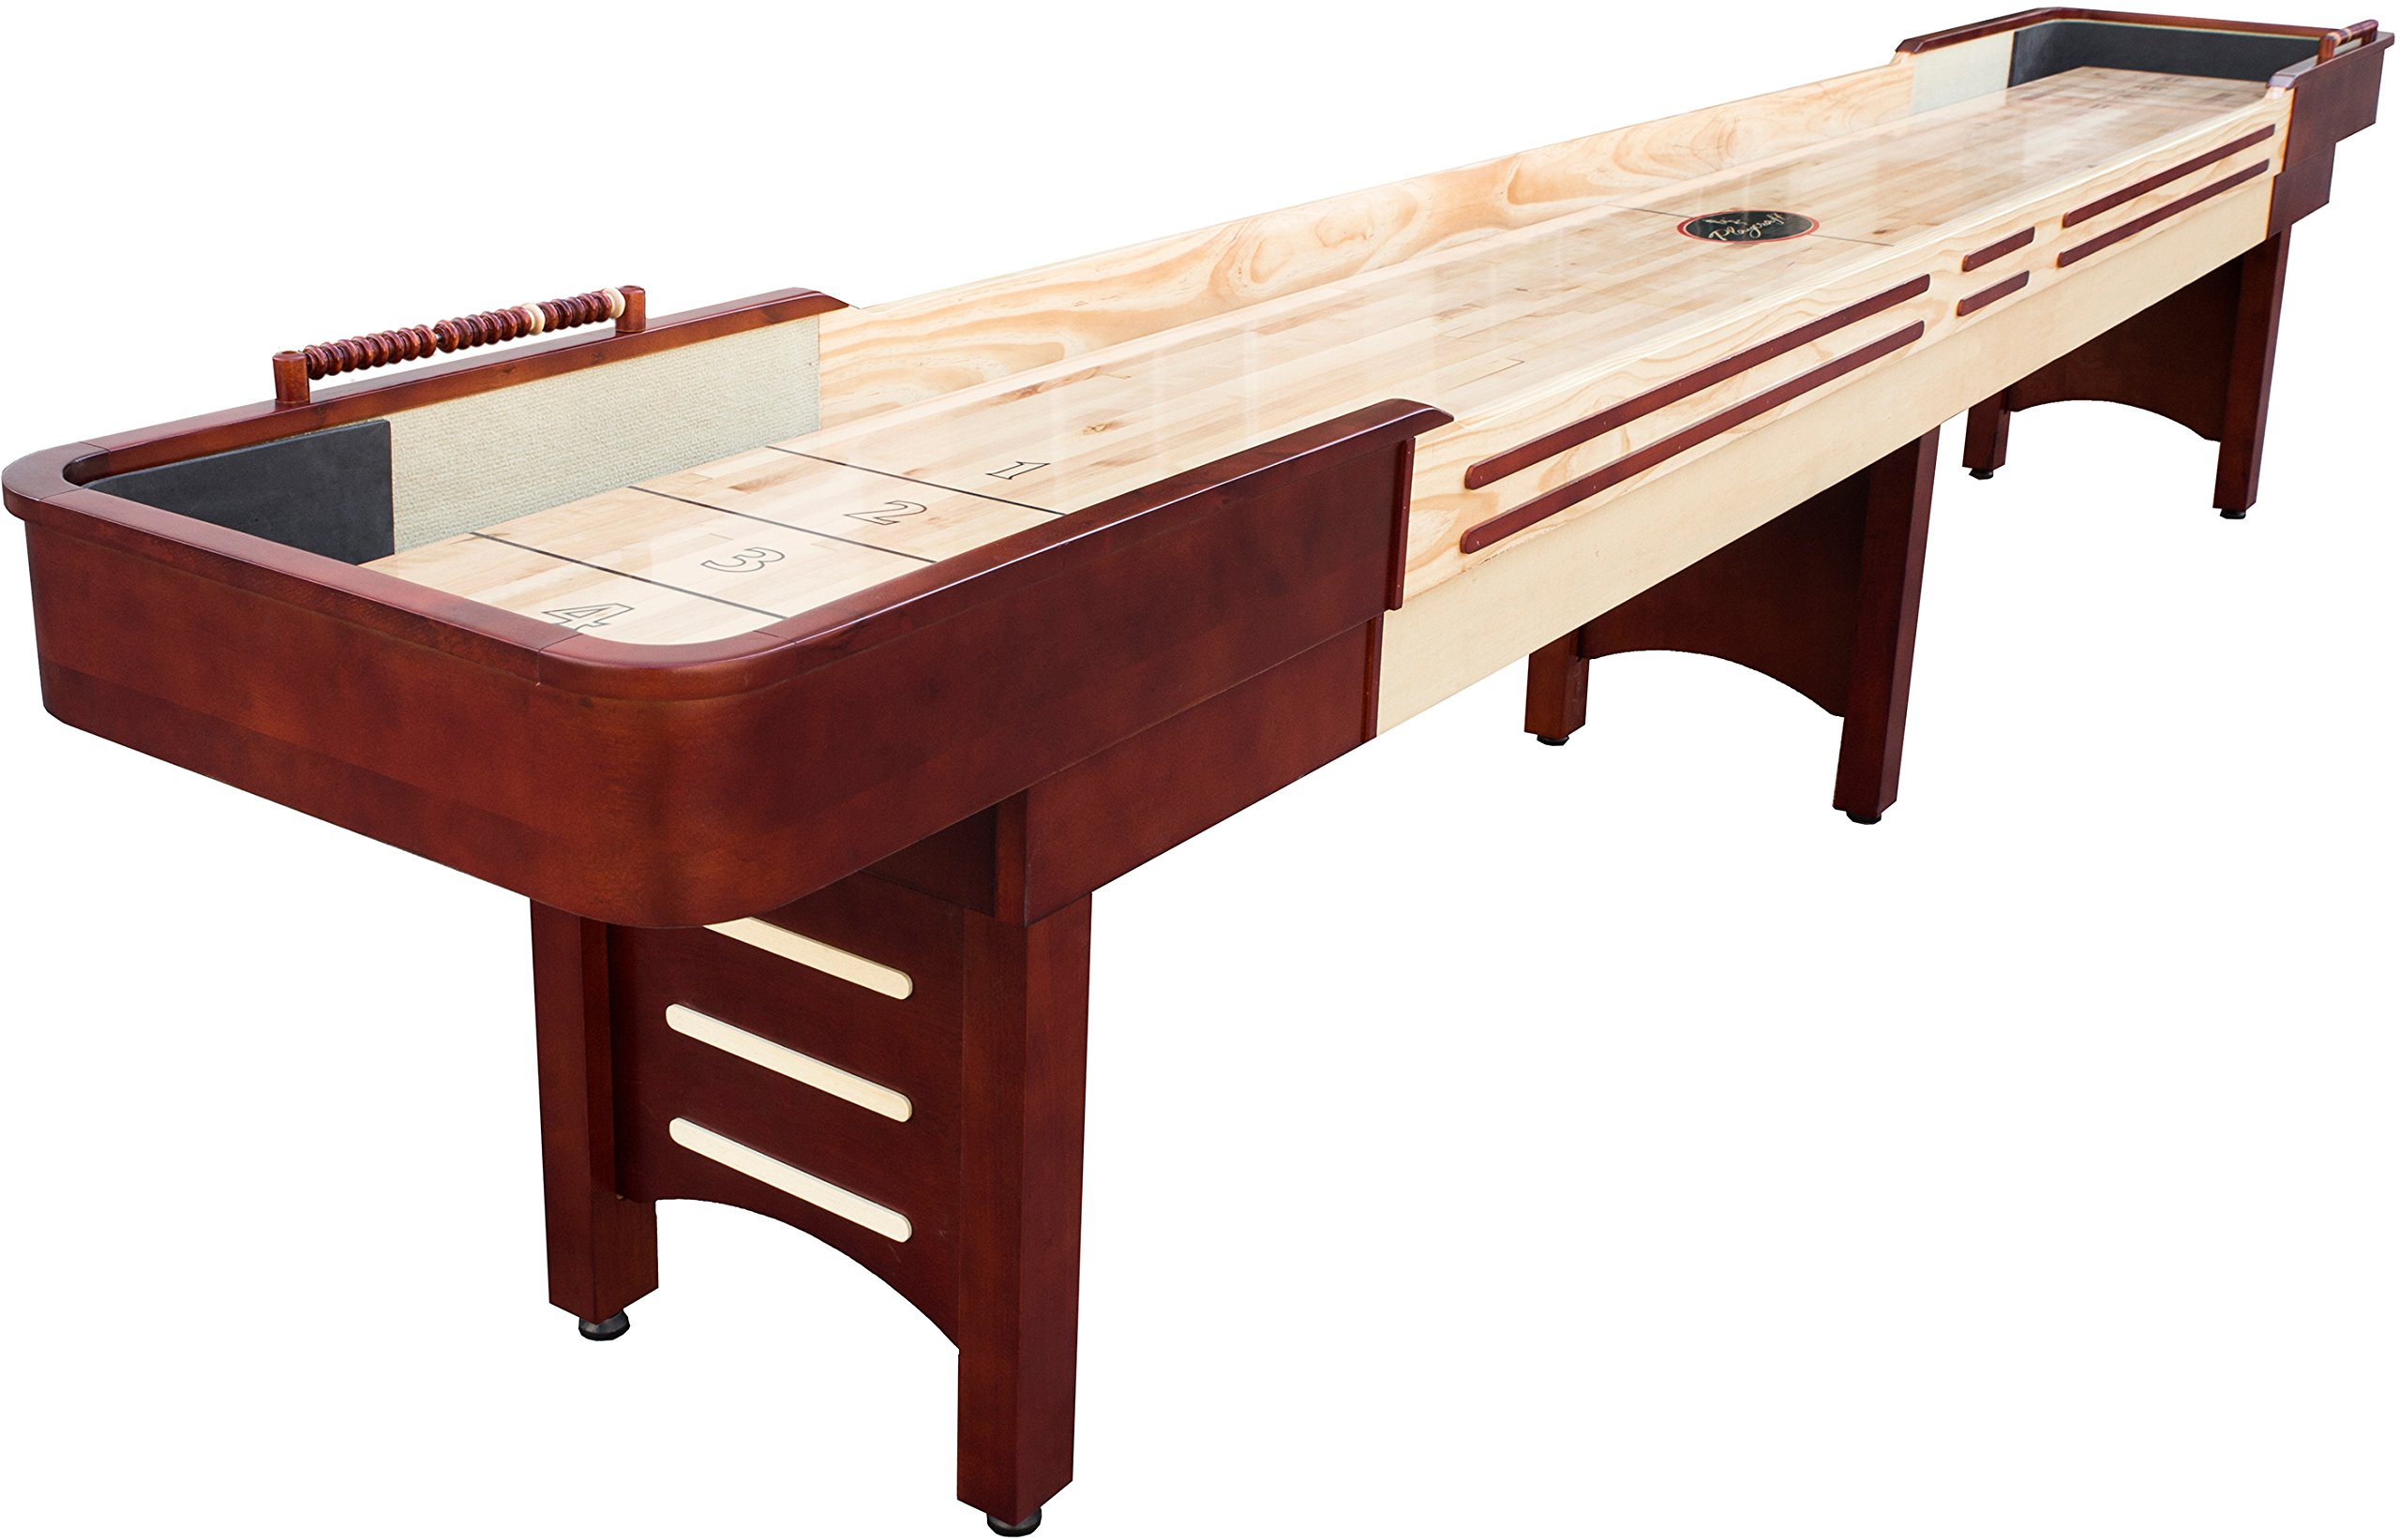 Playcraft Coventry Shuffleboard Table, Cherry, 16-Feet by Playcraft